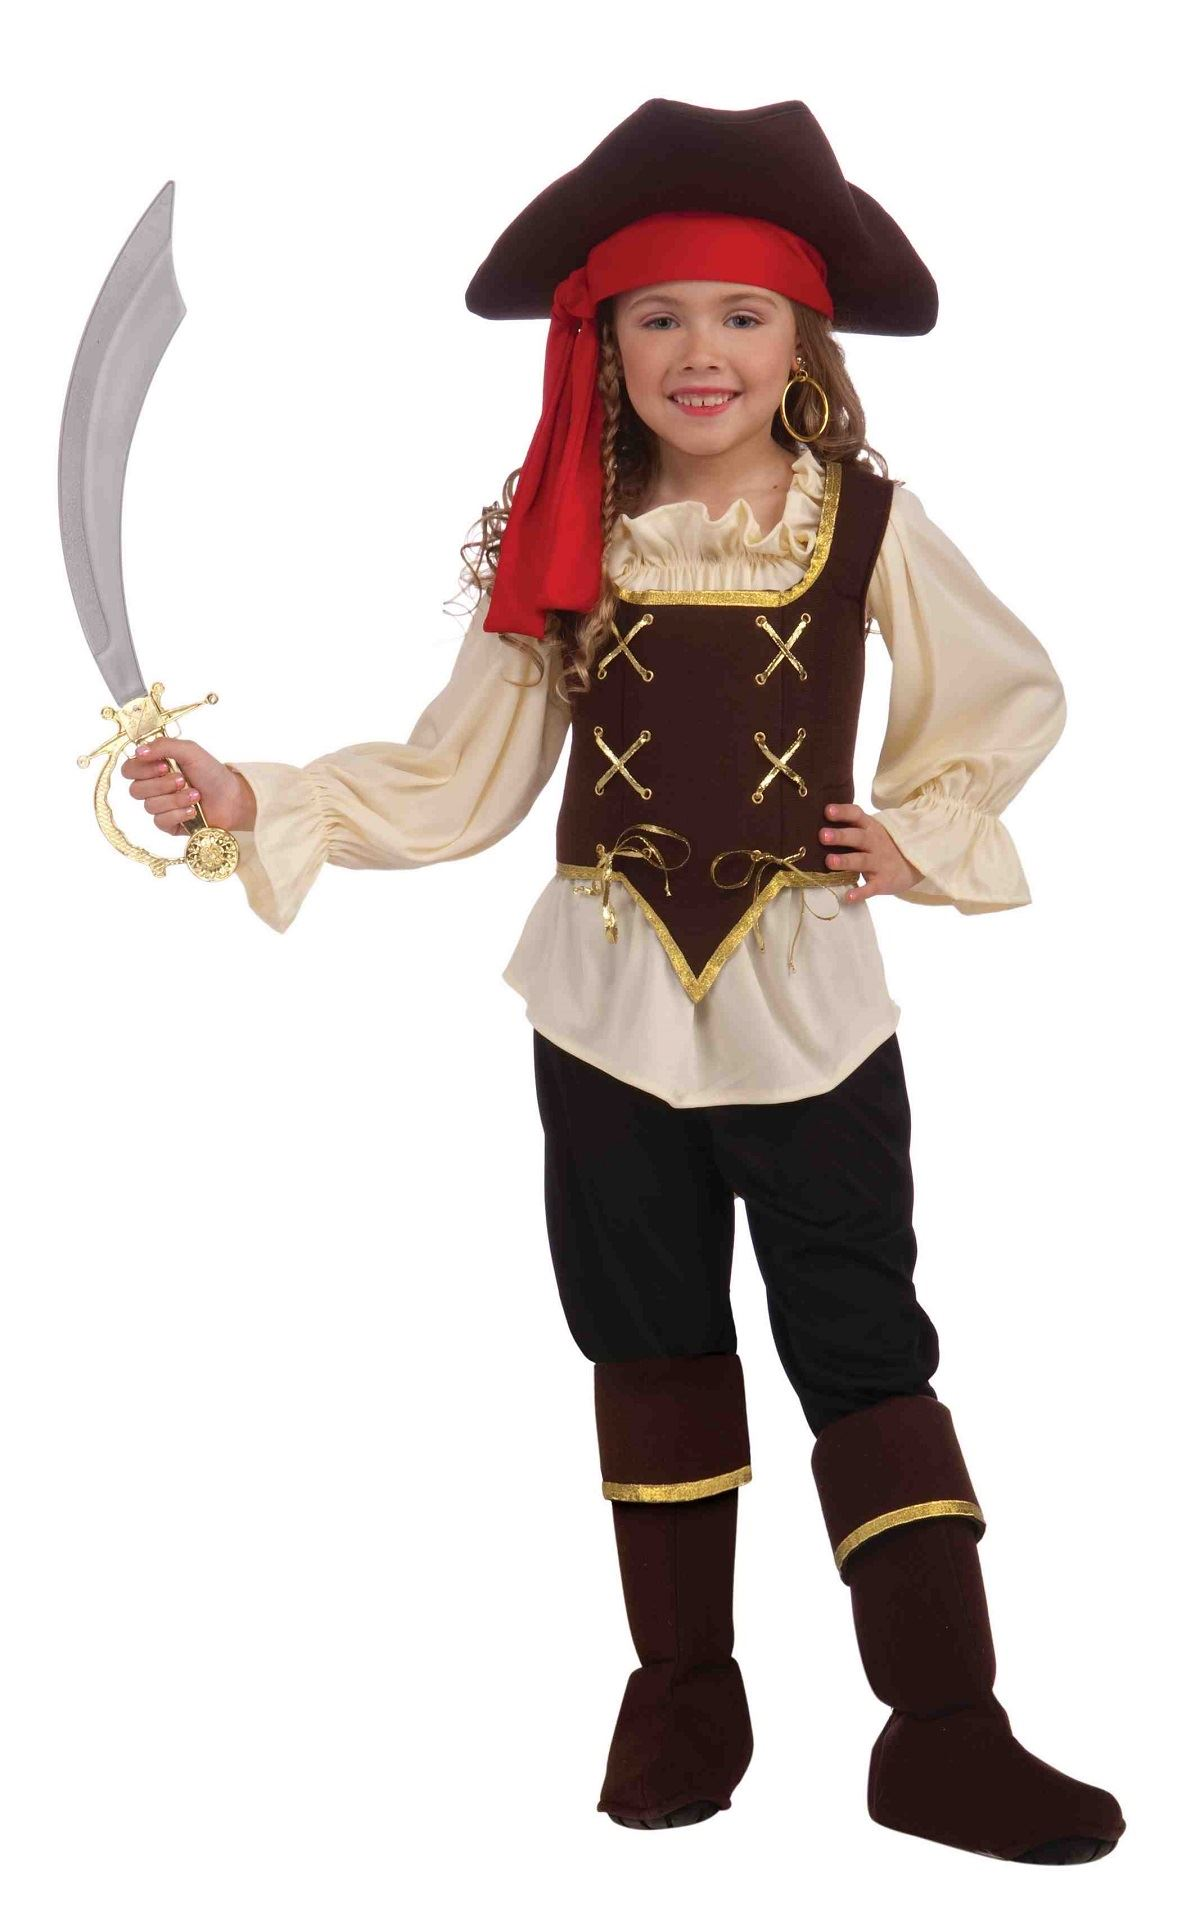 Kids Buccaneer Girl Pirate Costume | $22.99 | The Costume Land - photo#28